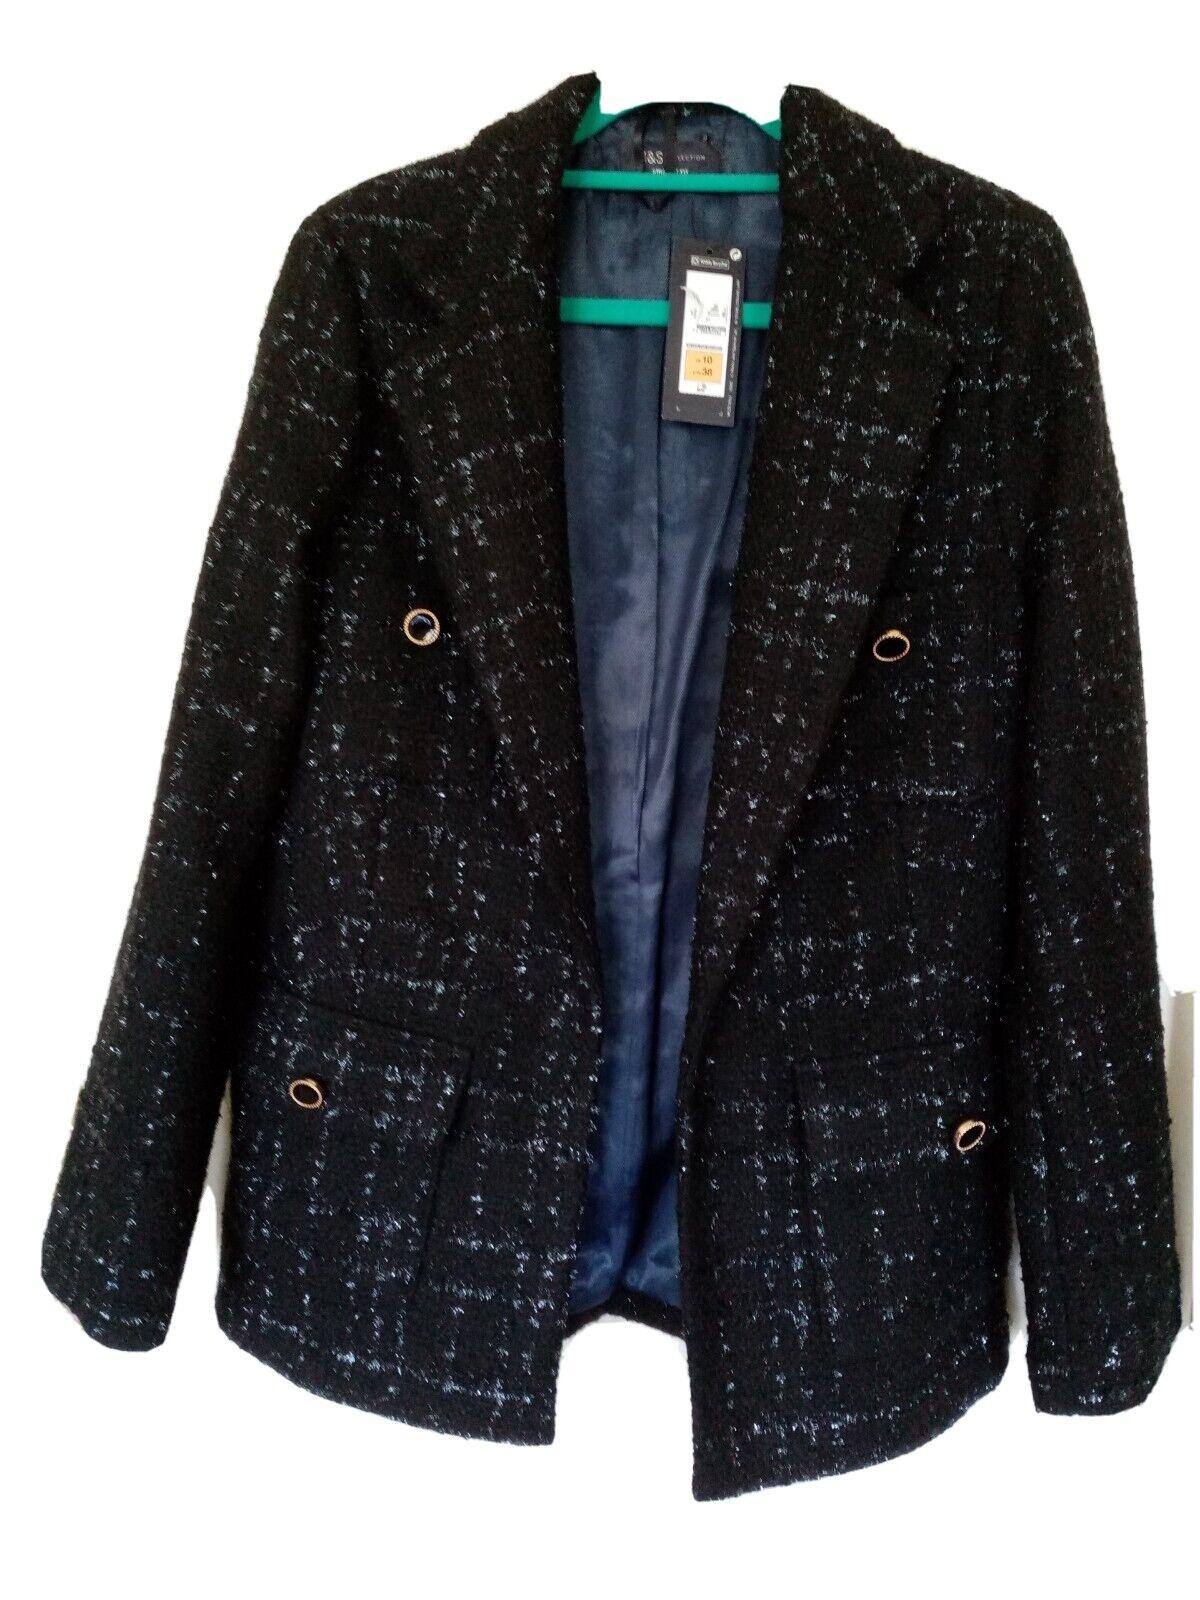 M&S Edge to Edge Boucle Jacket - 4 pockets - Black with metallic thread Size 10